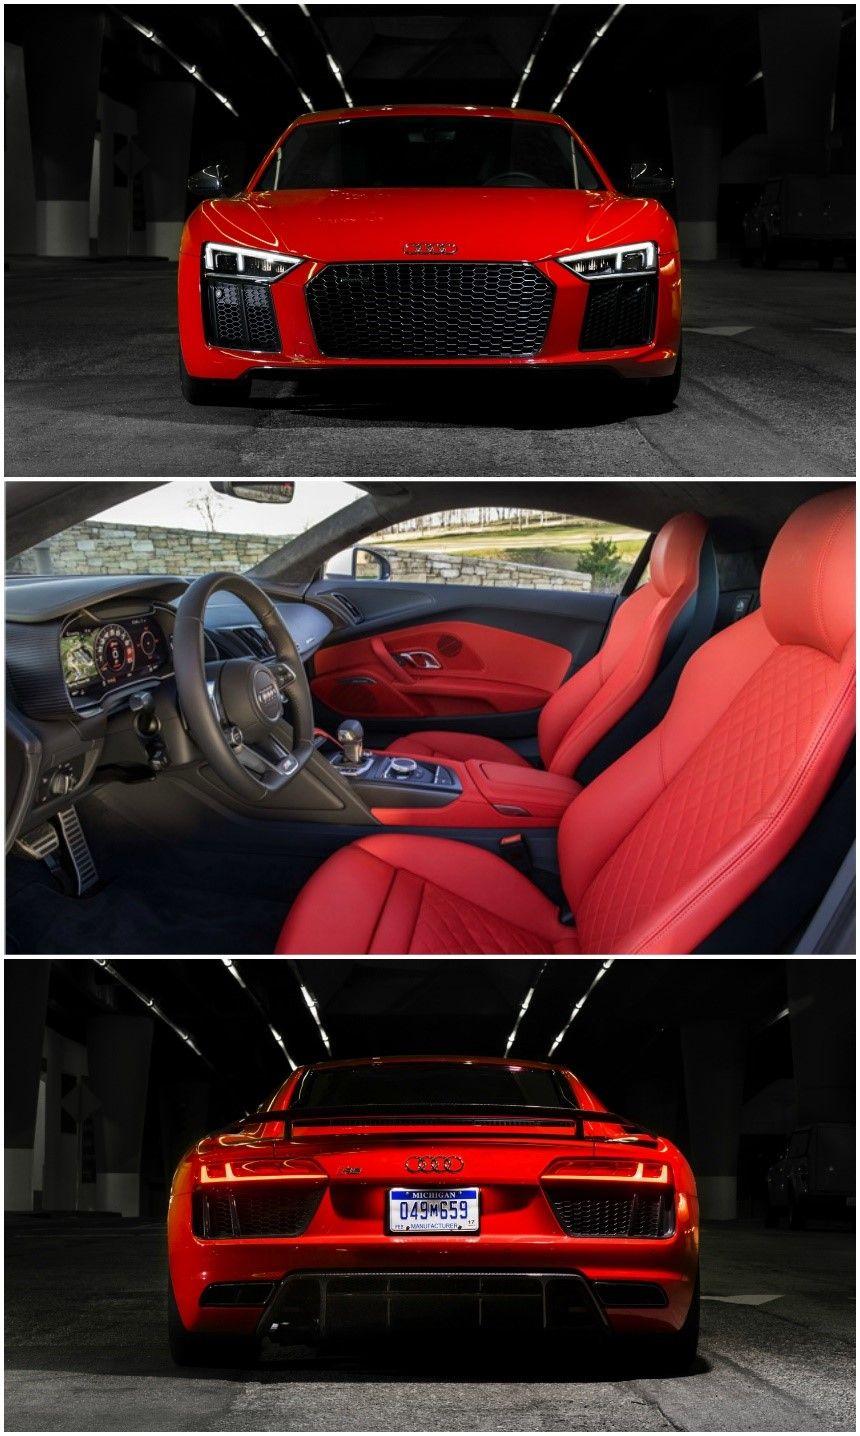 2020 Audi R8 Review Pricing And Specs Audi R8 V10 Plus Audi Audi R8